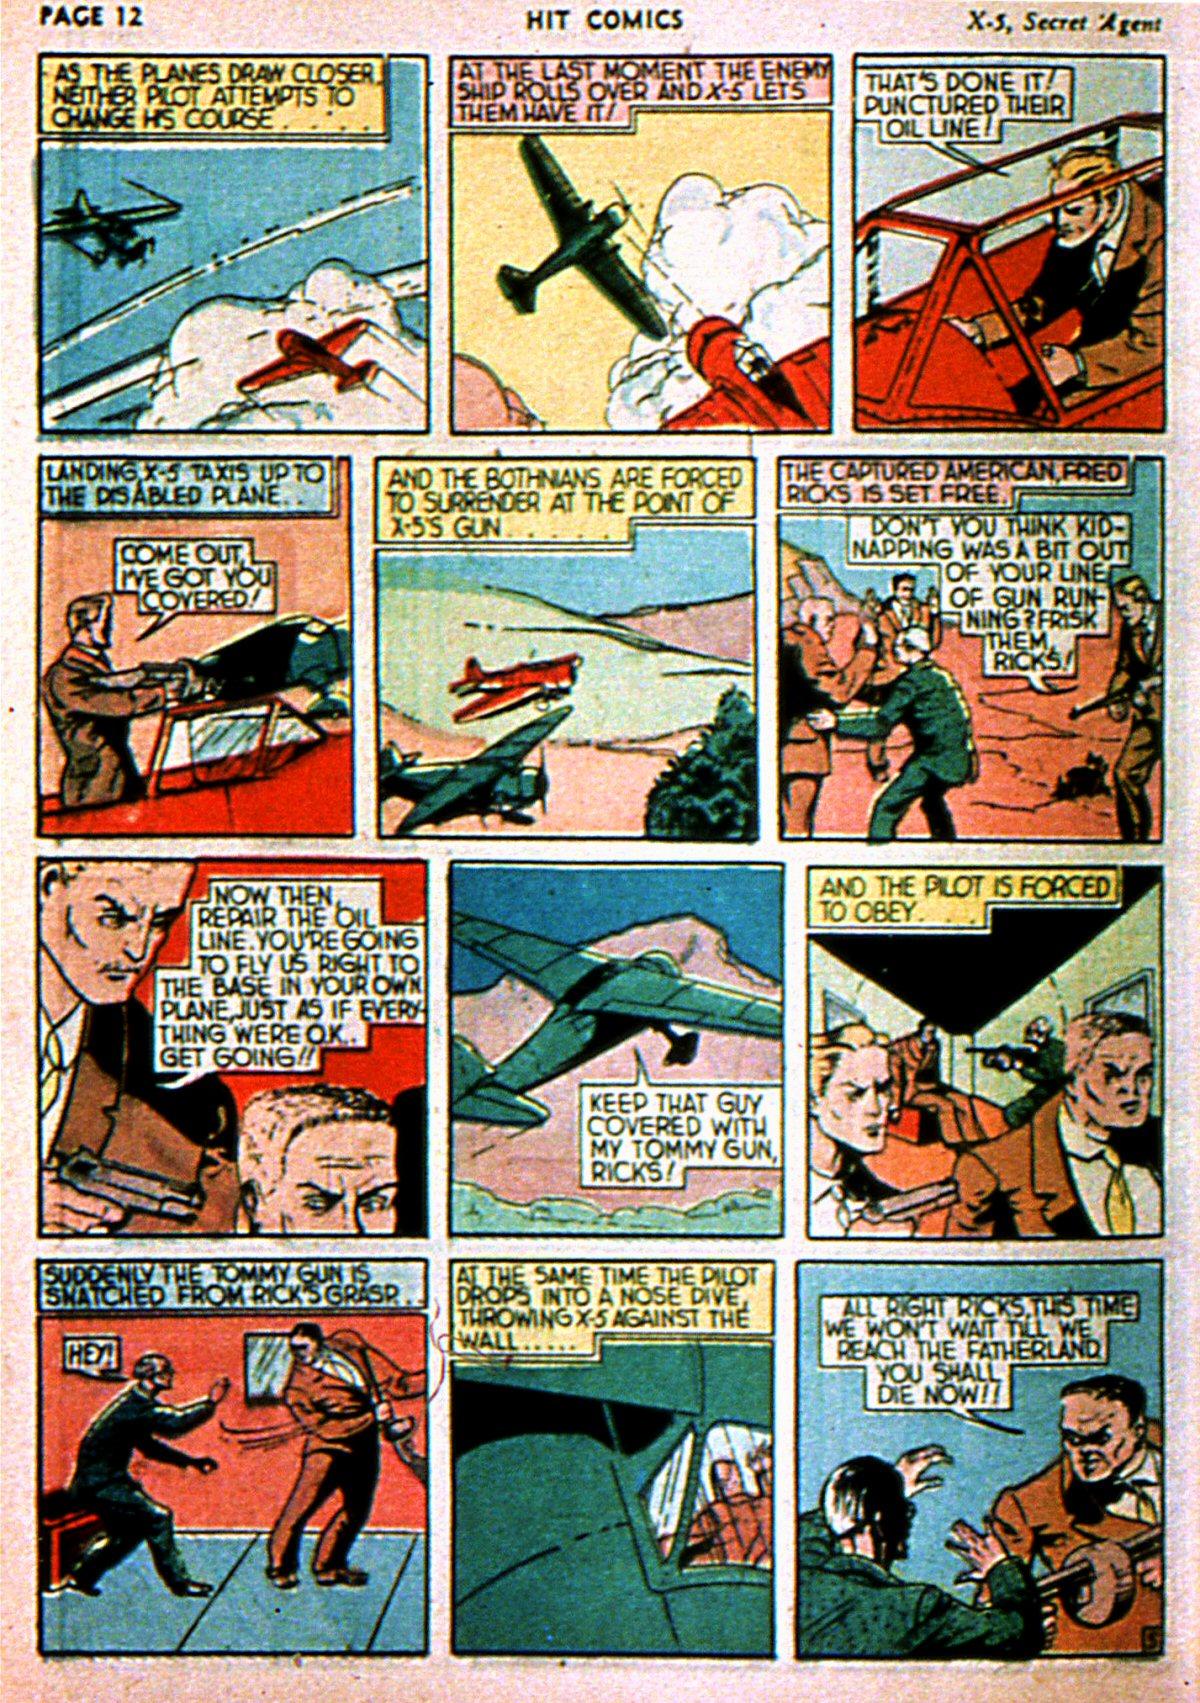 Read online Hit Comics comic -  Issue #3 - 14